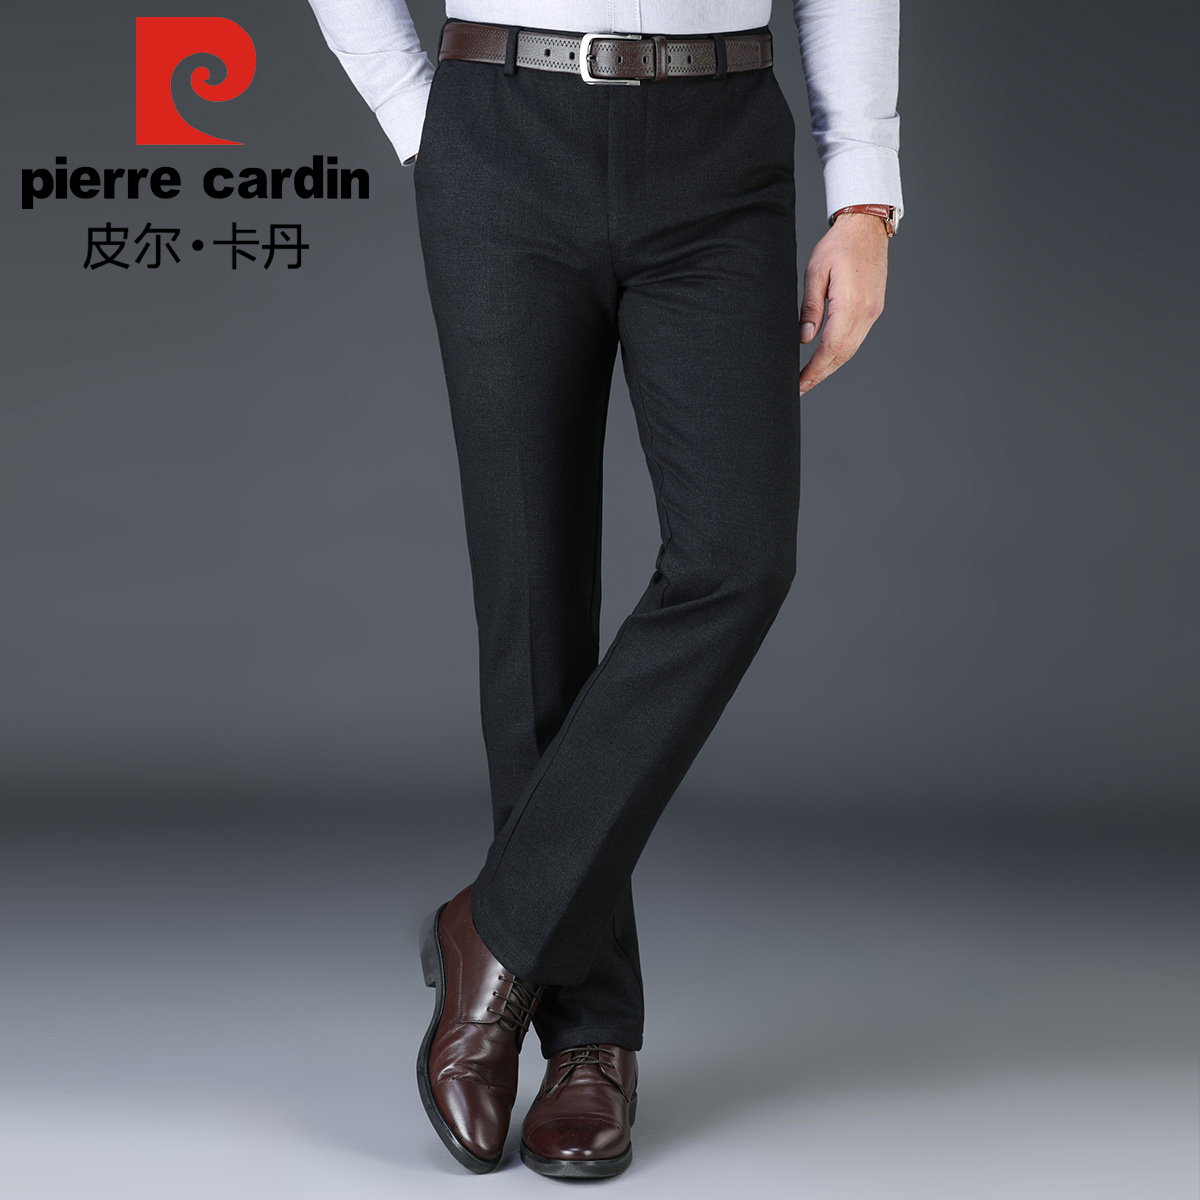 Pierre Cardin knitted suit pants mens summer business loose straight pants elastic slim Korean casual pants